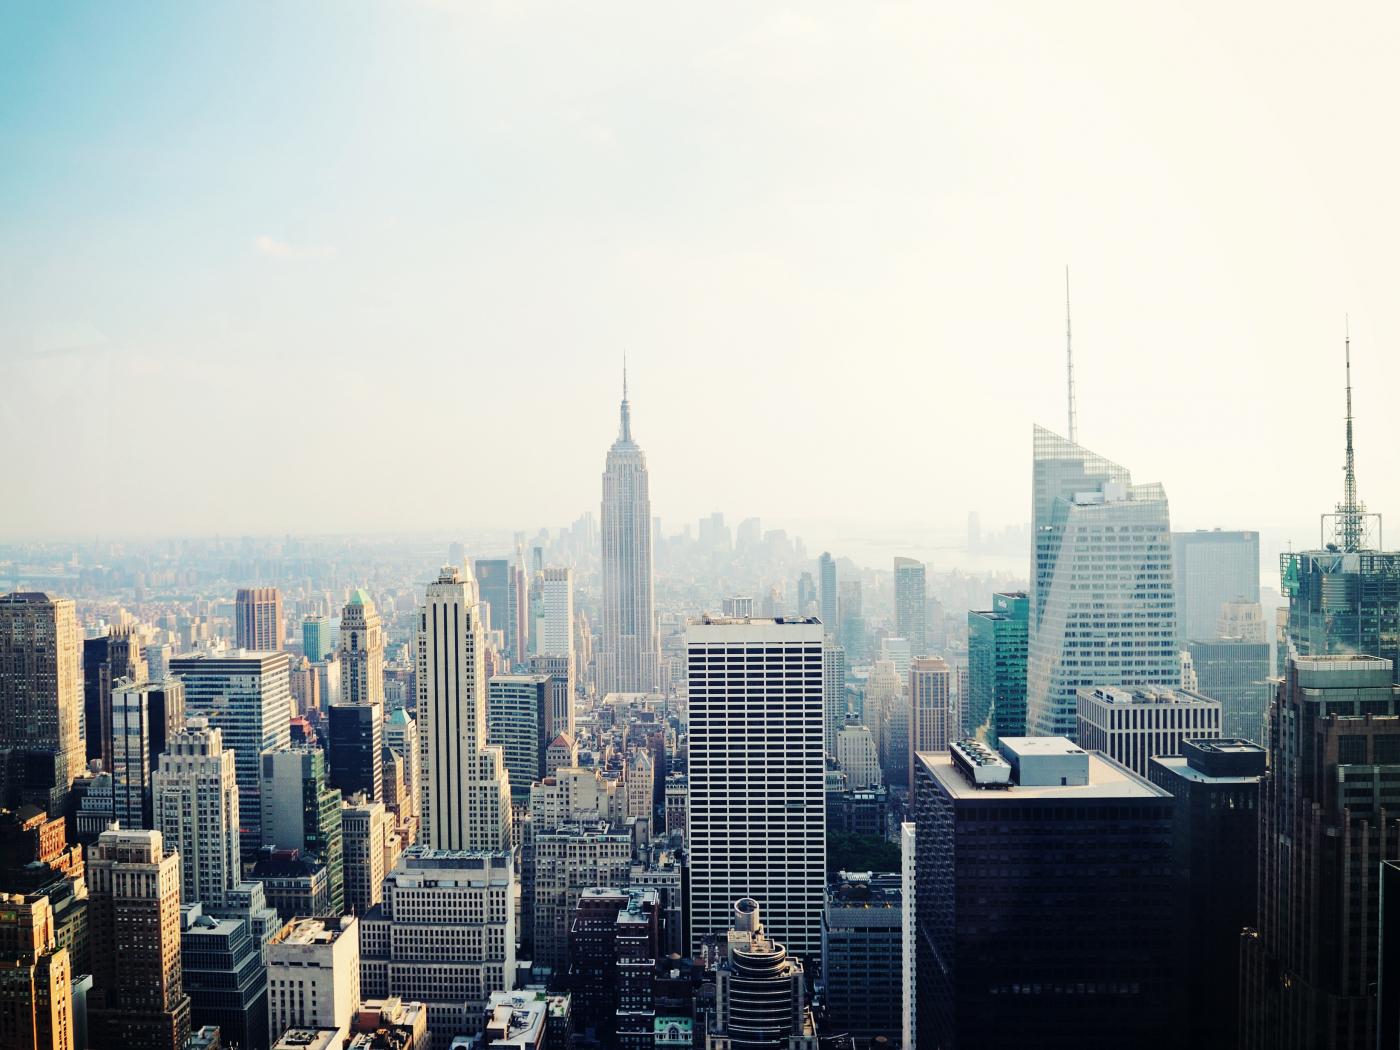 New York, cityscape, buildings, 1400x1050 wallpaper